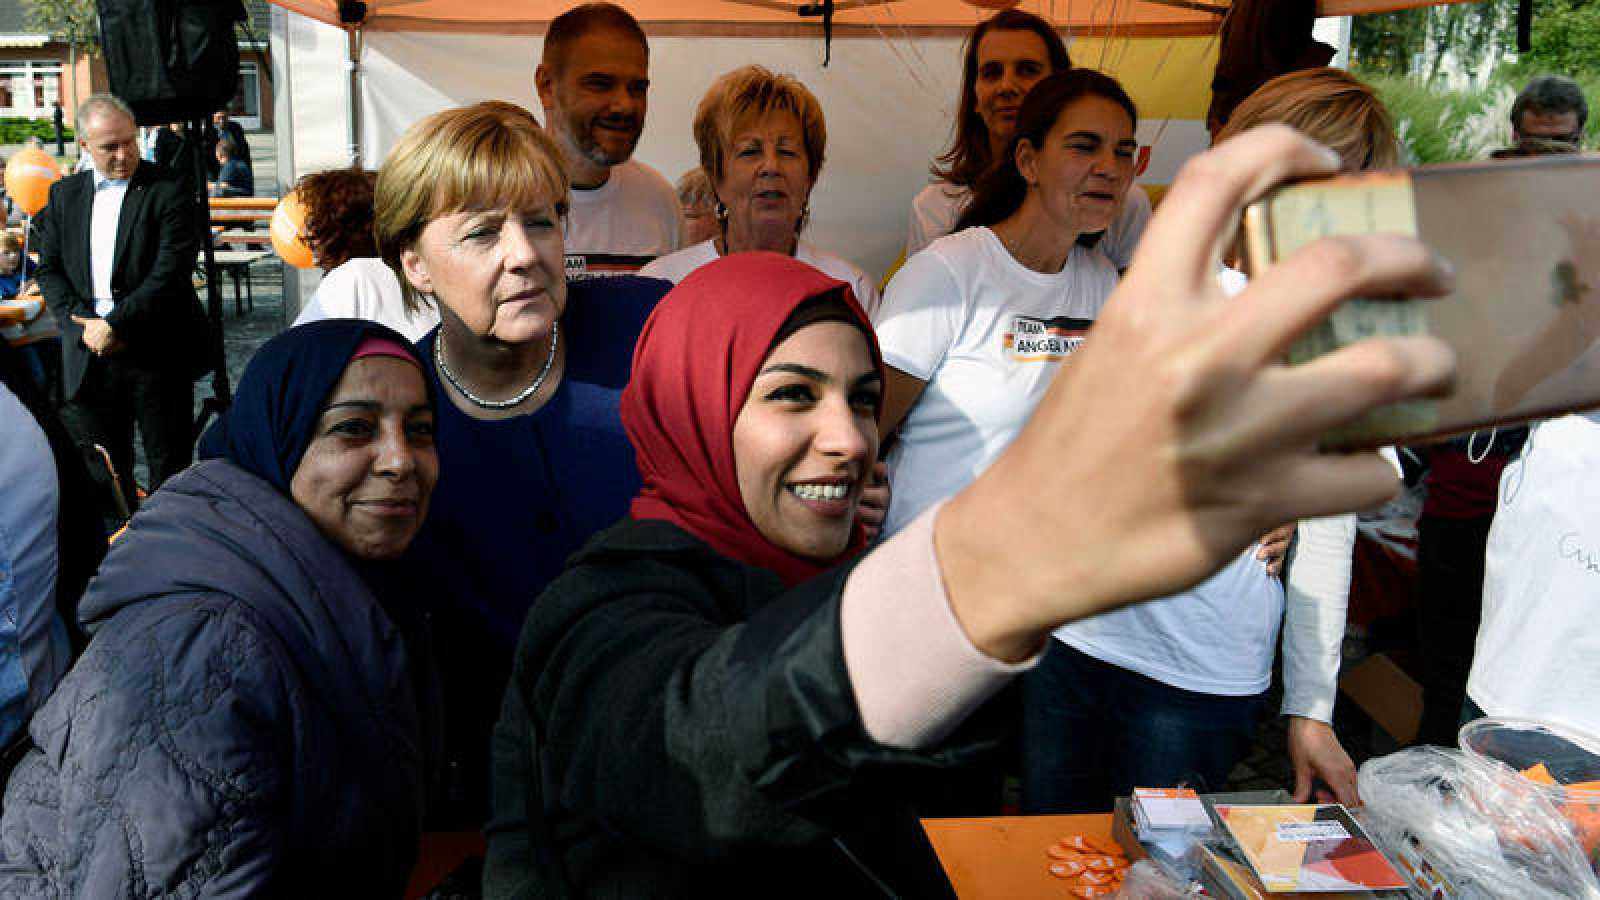 Una refugiada siria posa para un selfie con Angela Merkel